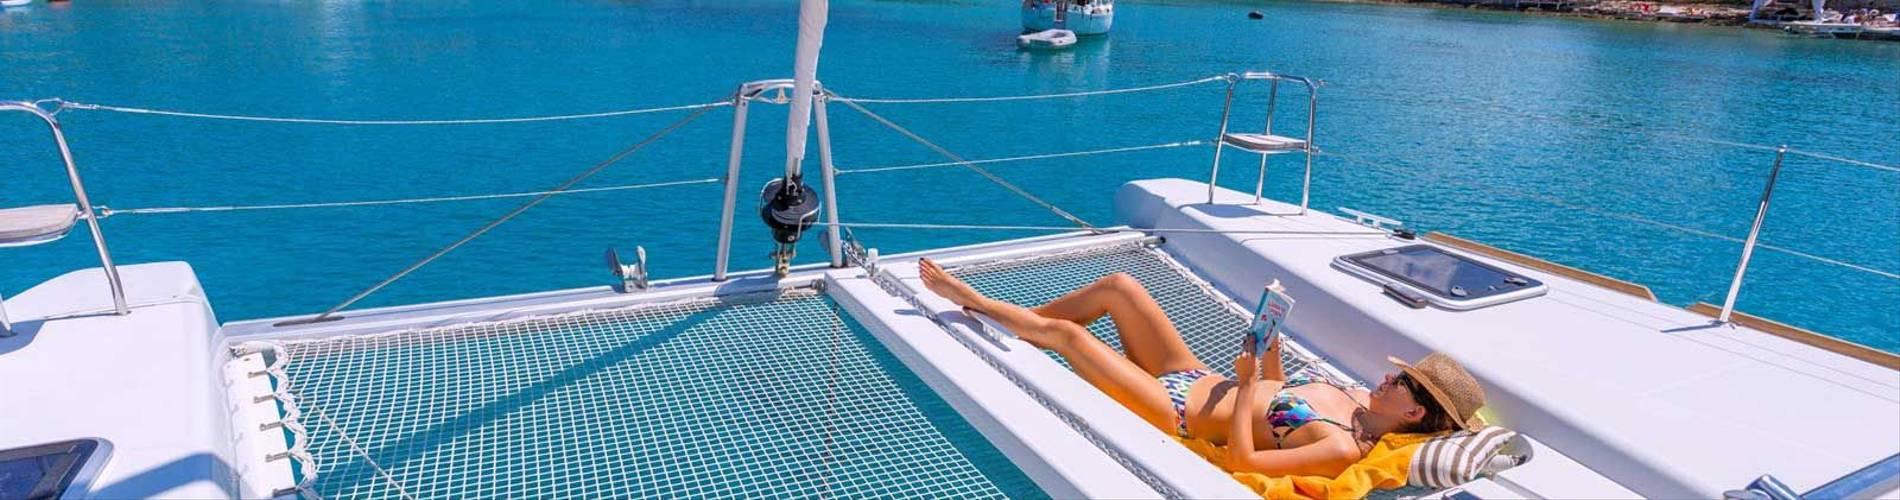 catamaran cruise 1.jpg